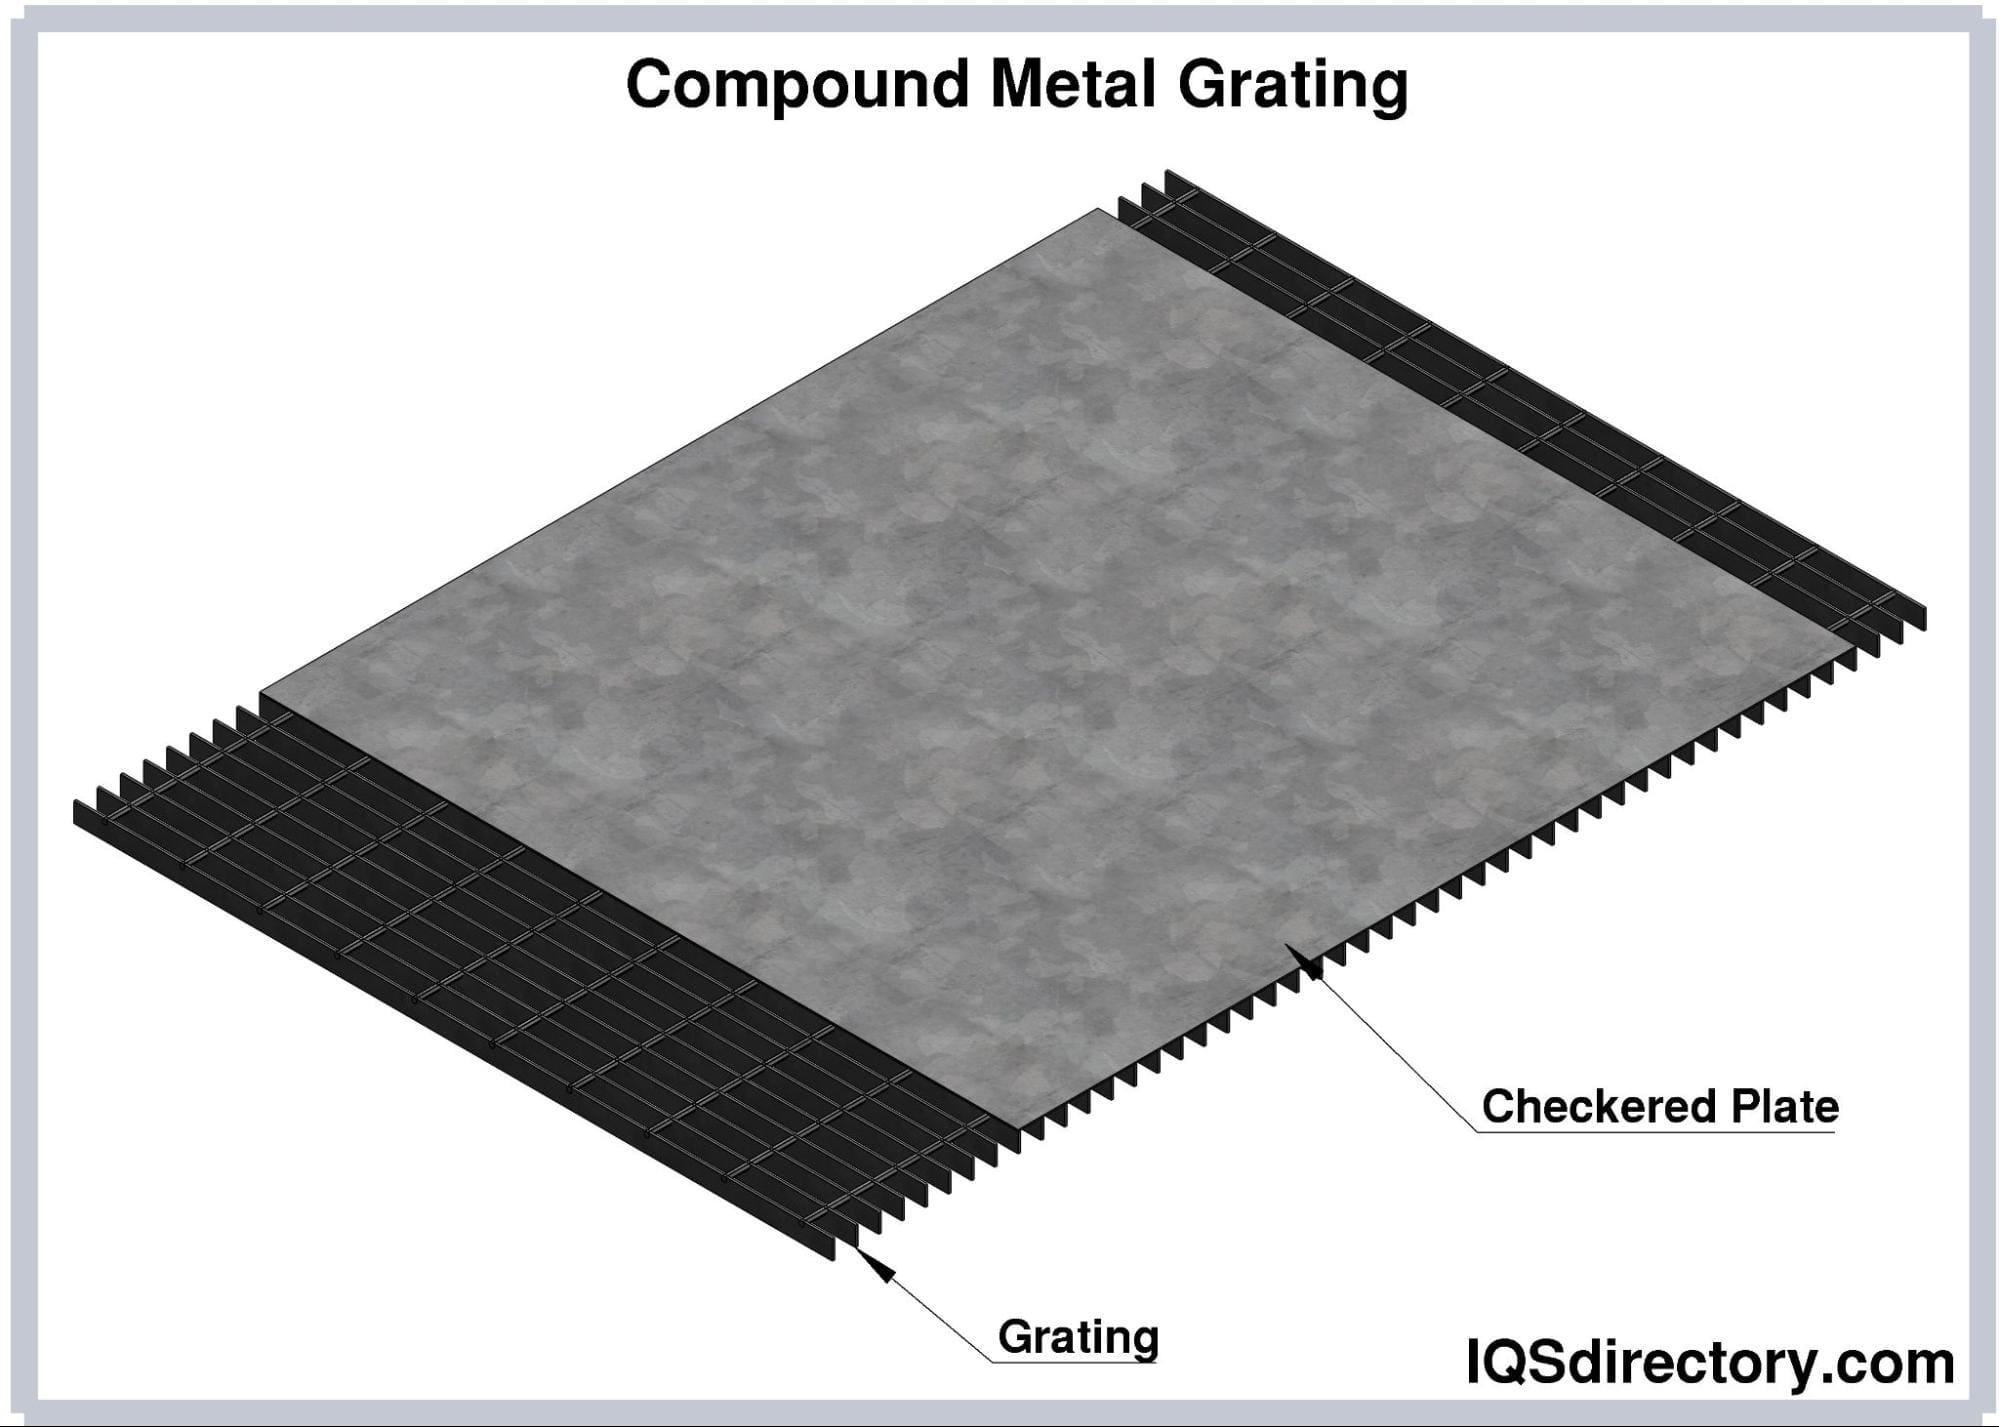 Compound Metal Grating